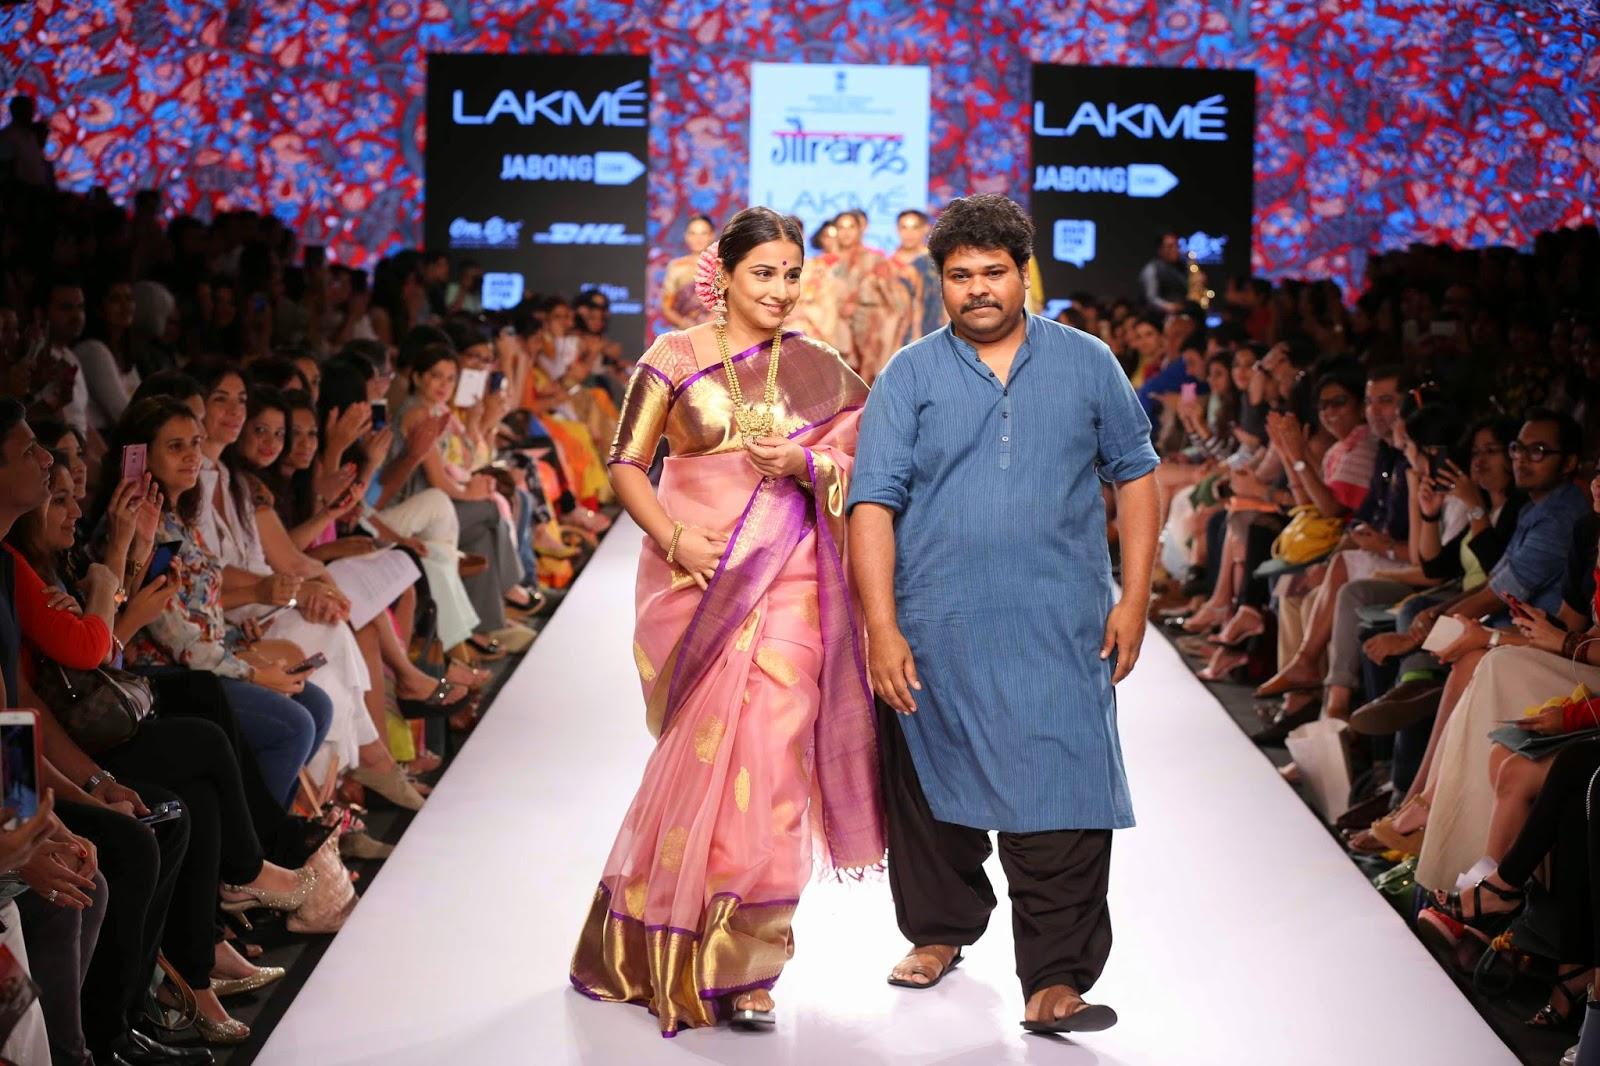 http://aquaintperspective.blogspot.in/, LIFW Day 2 Gaurang Shah